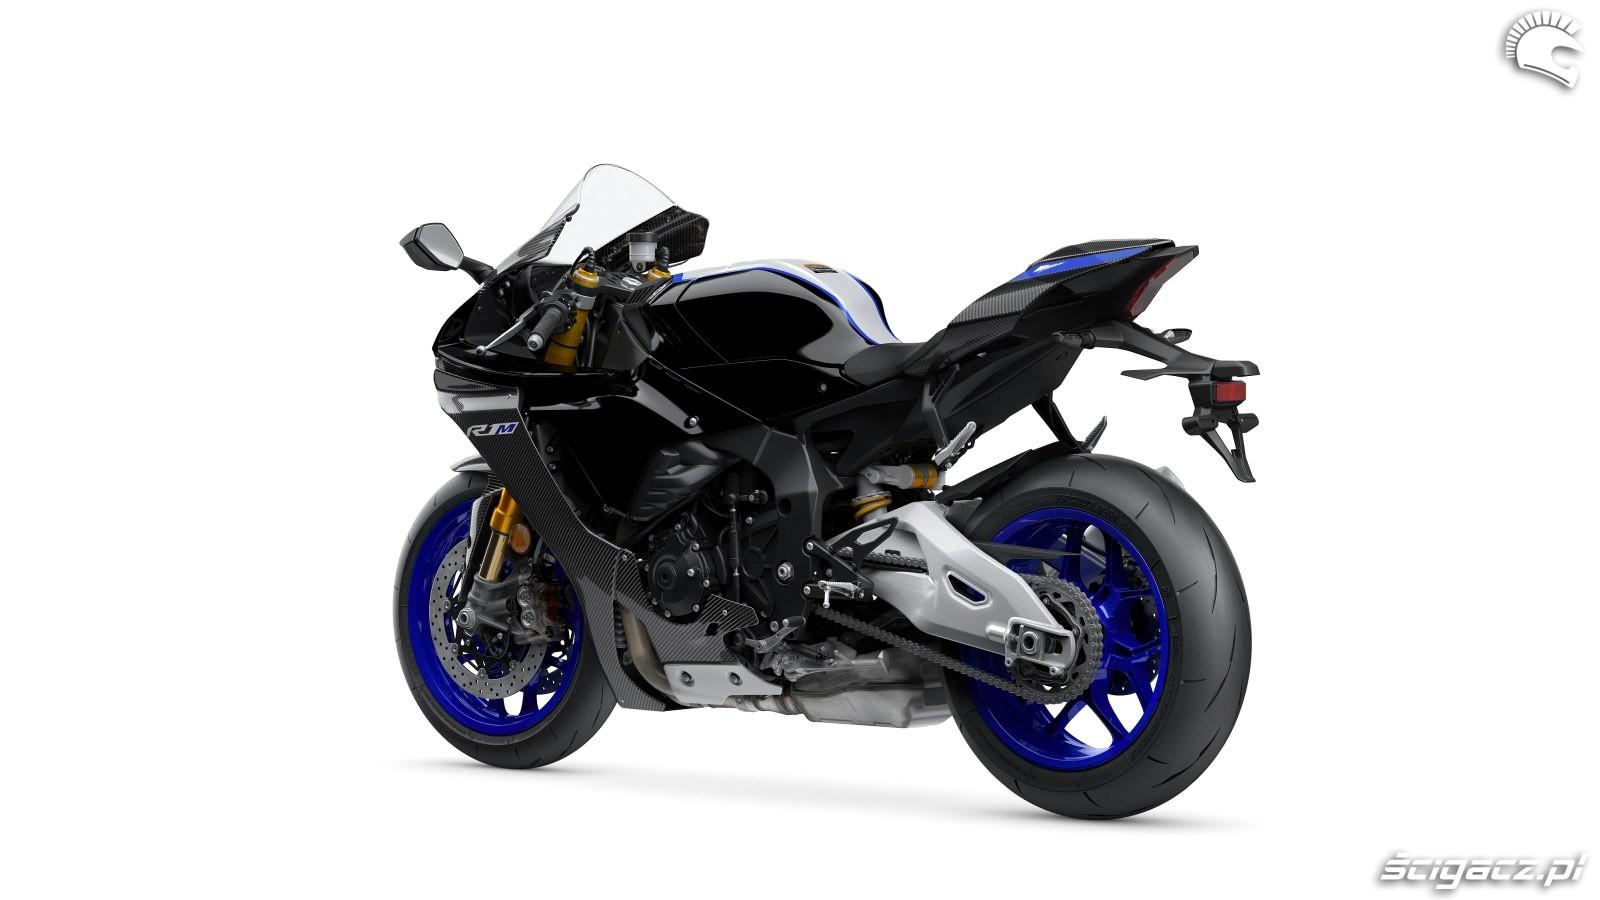 101 Yamaha R1 2020 studio 3